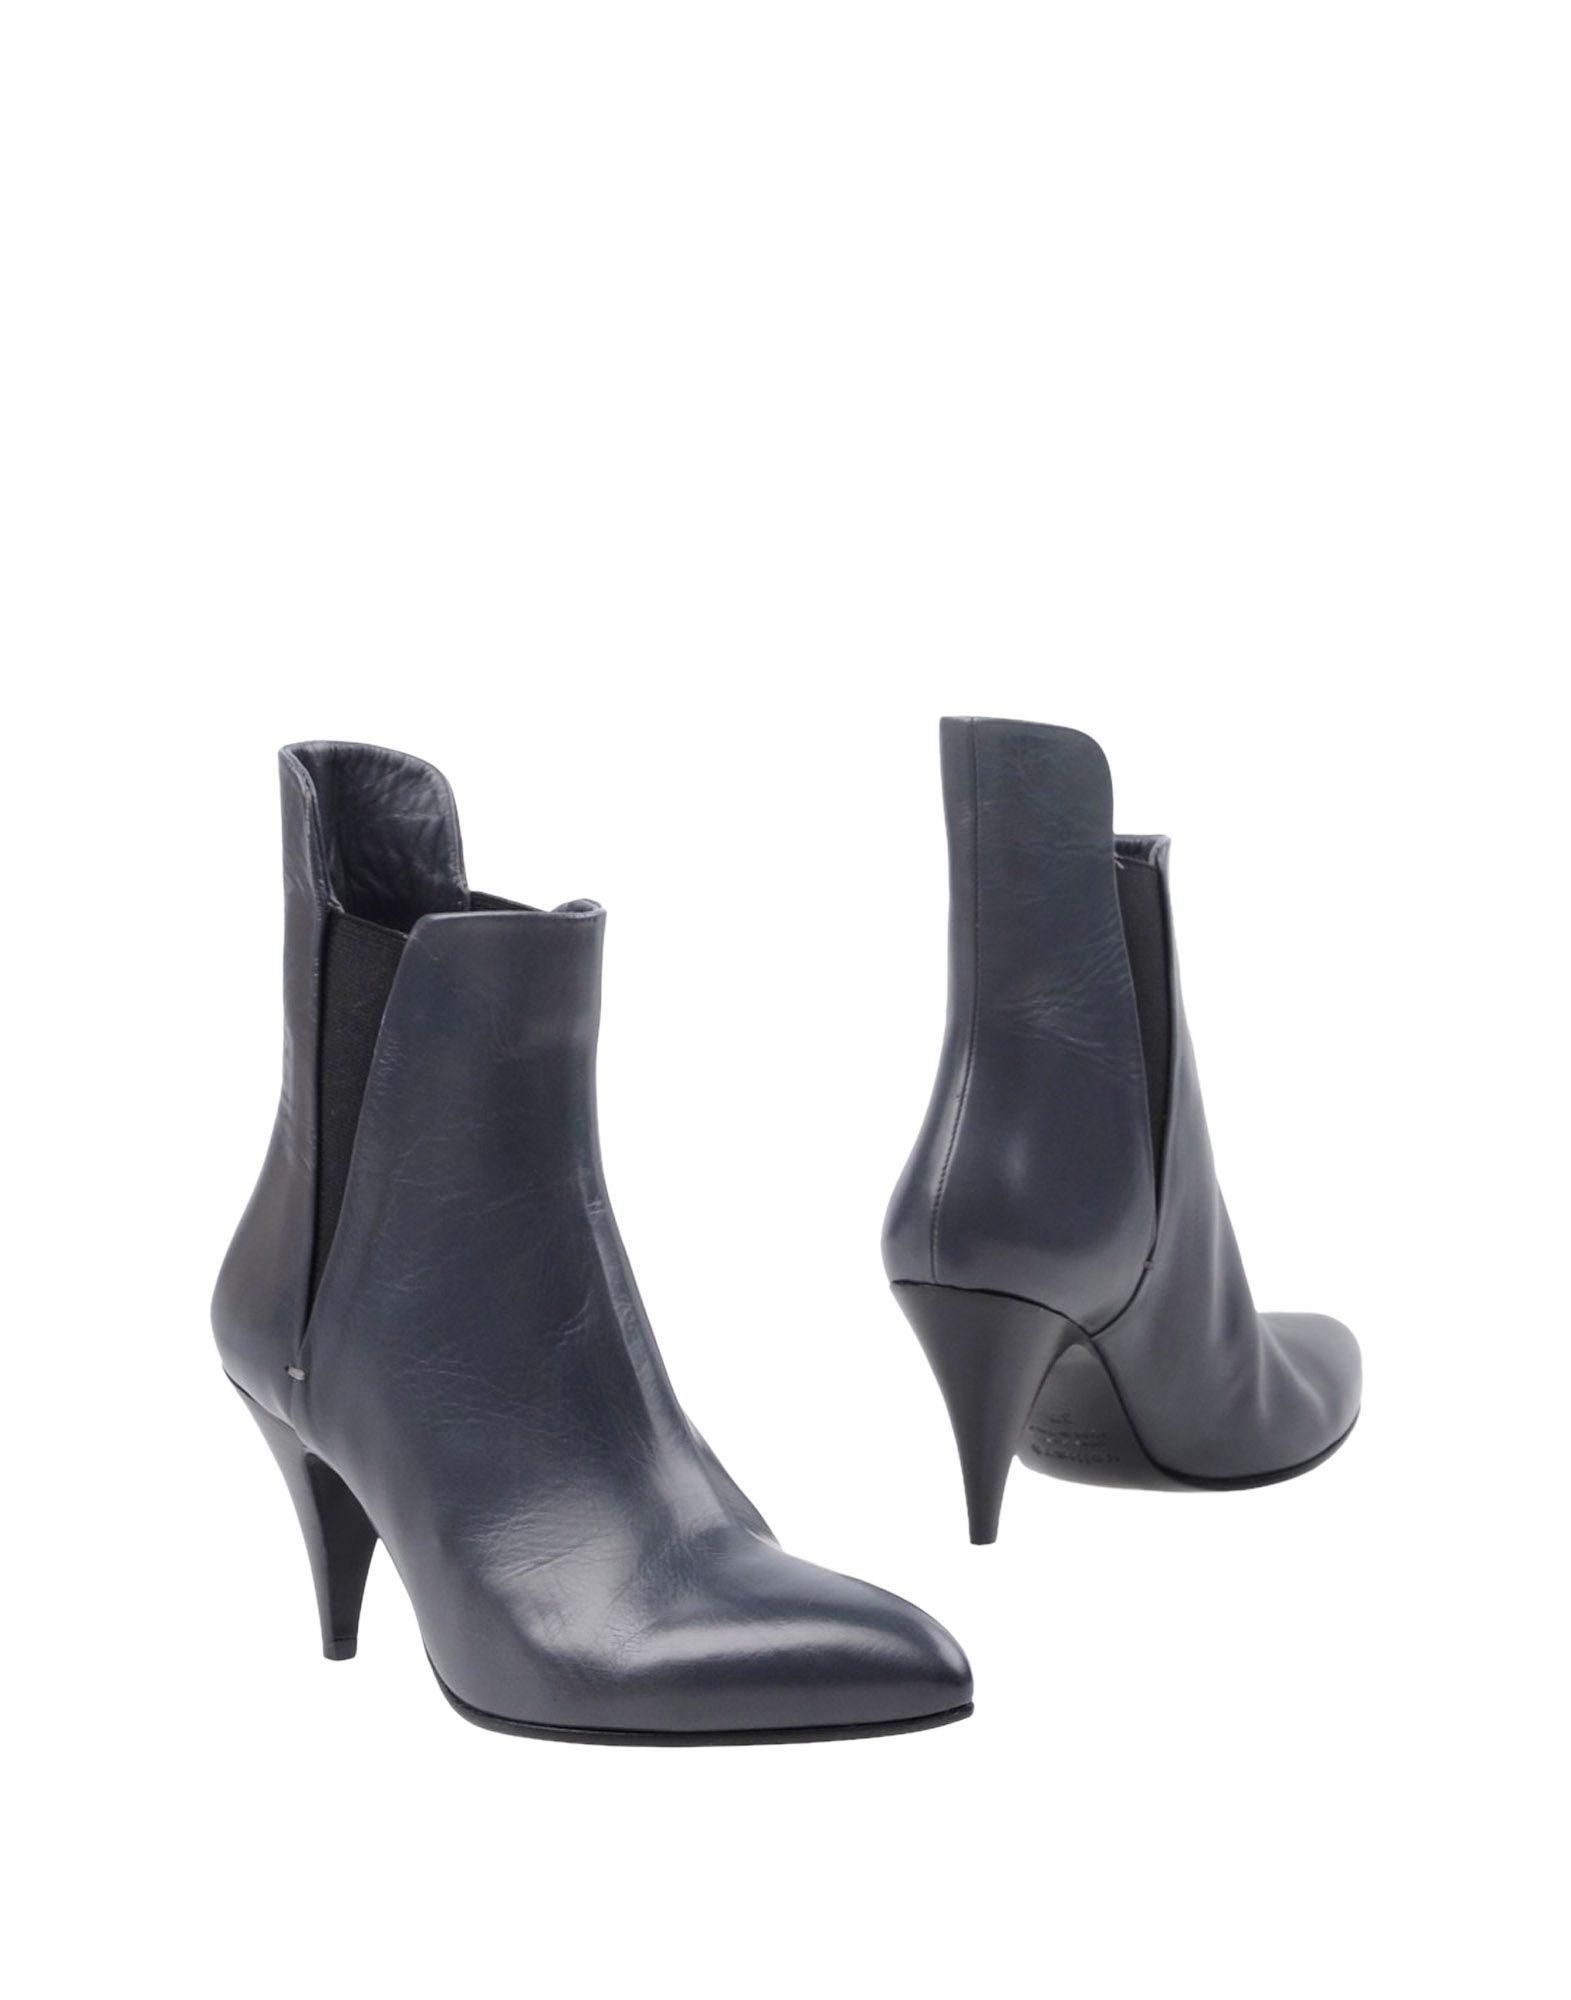 Kallistè Stiefelette Damen  11365248QP Gute Qualität beliebte Schuhe